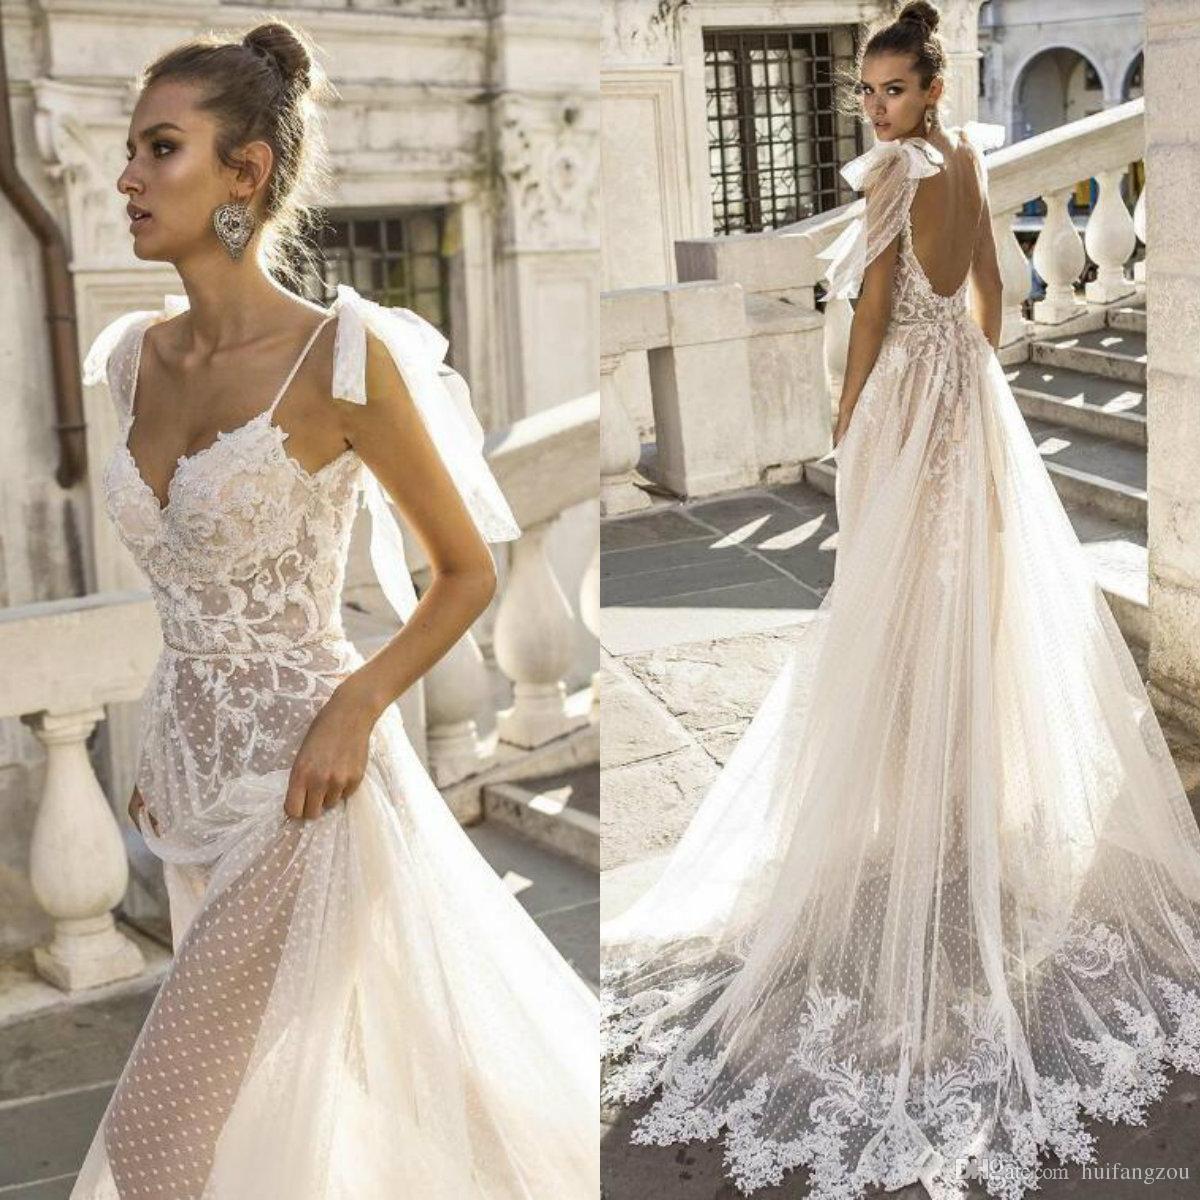 2019 Sexy Boho Wedding Dresses Spaghetti Straps Illusion Lace Backless Bridal Gowns Vestido De Novia Beach Wedding Dress Cheap